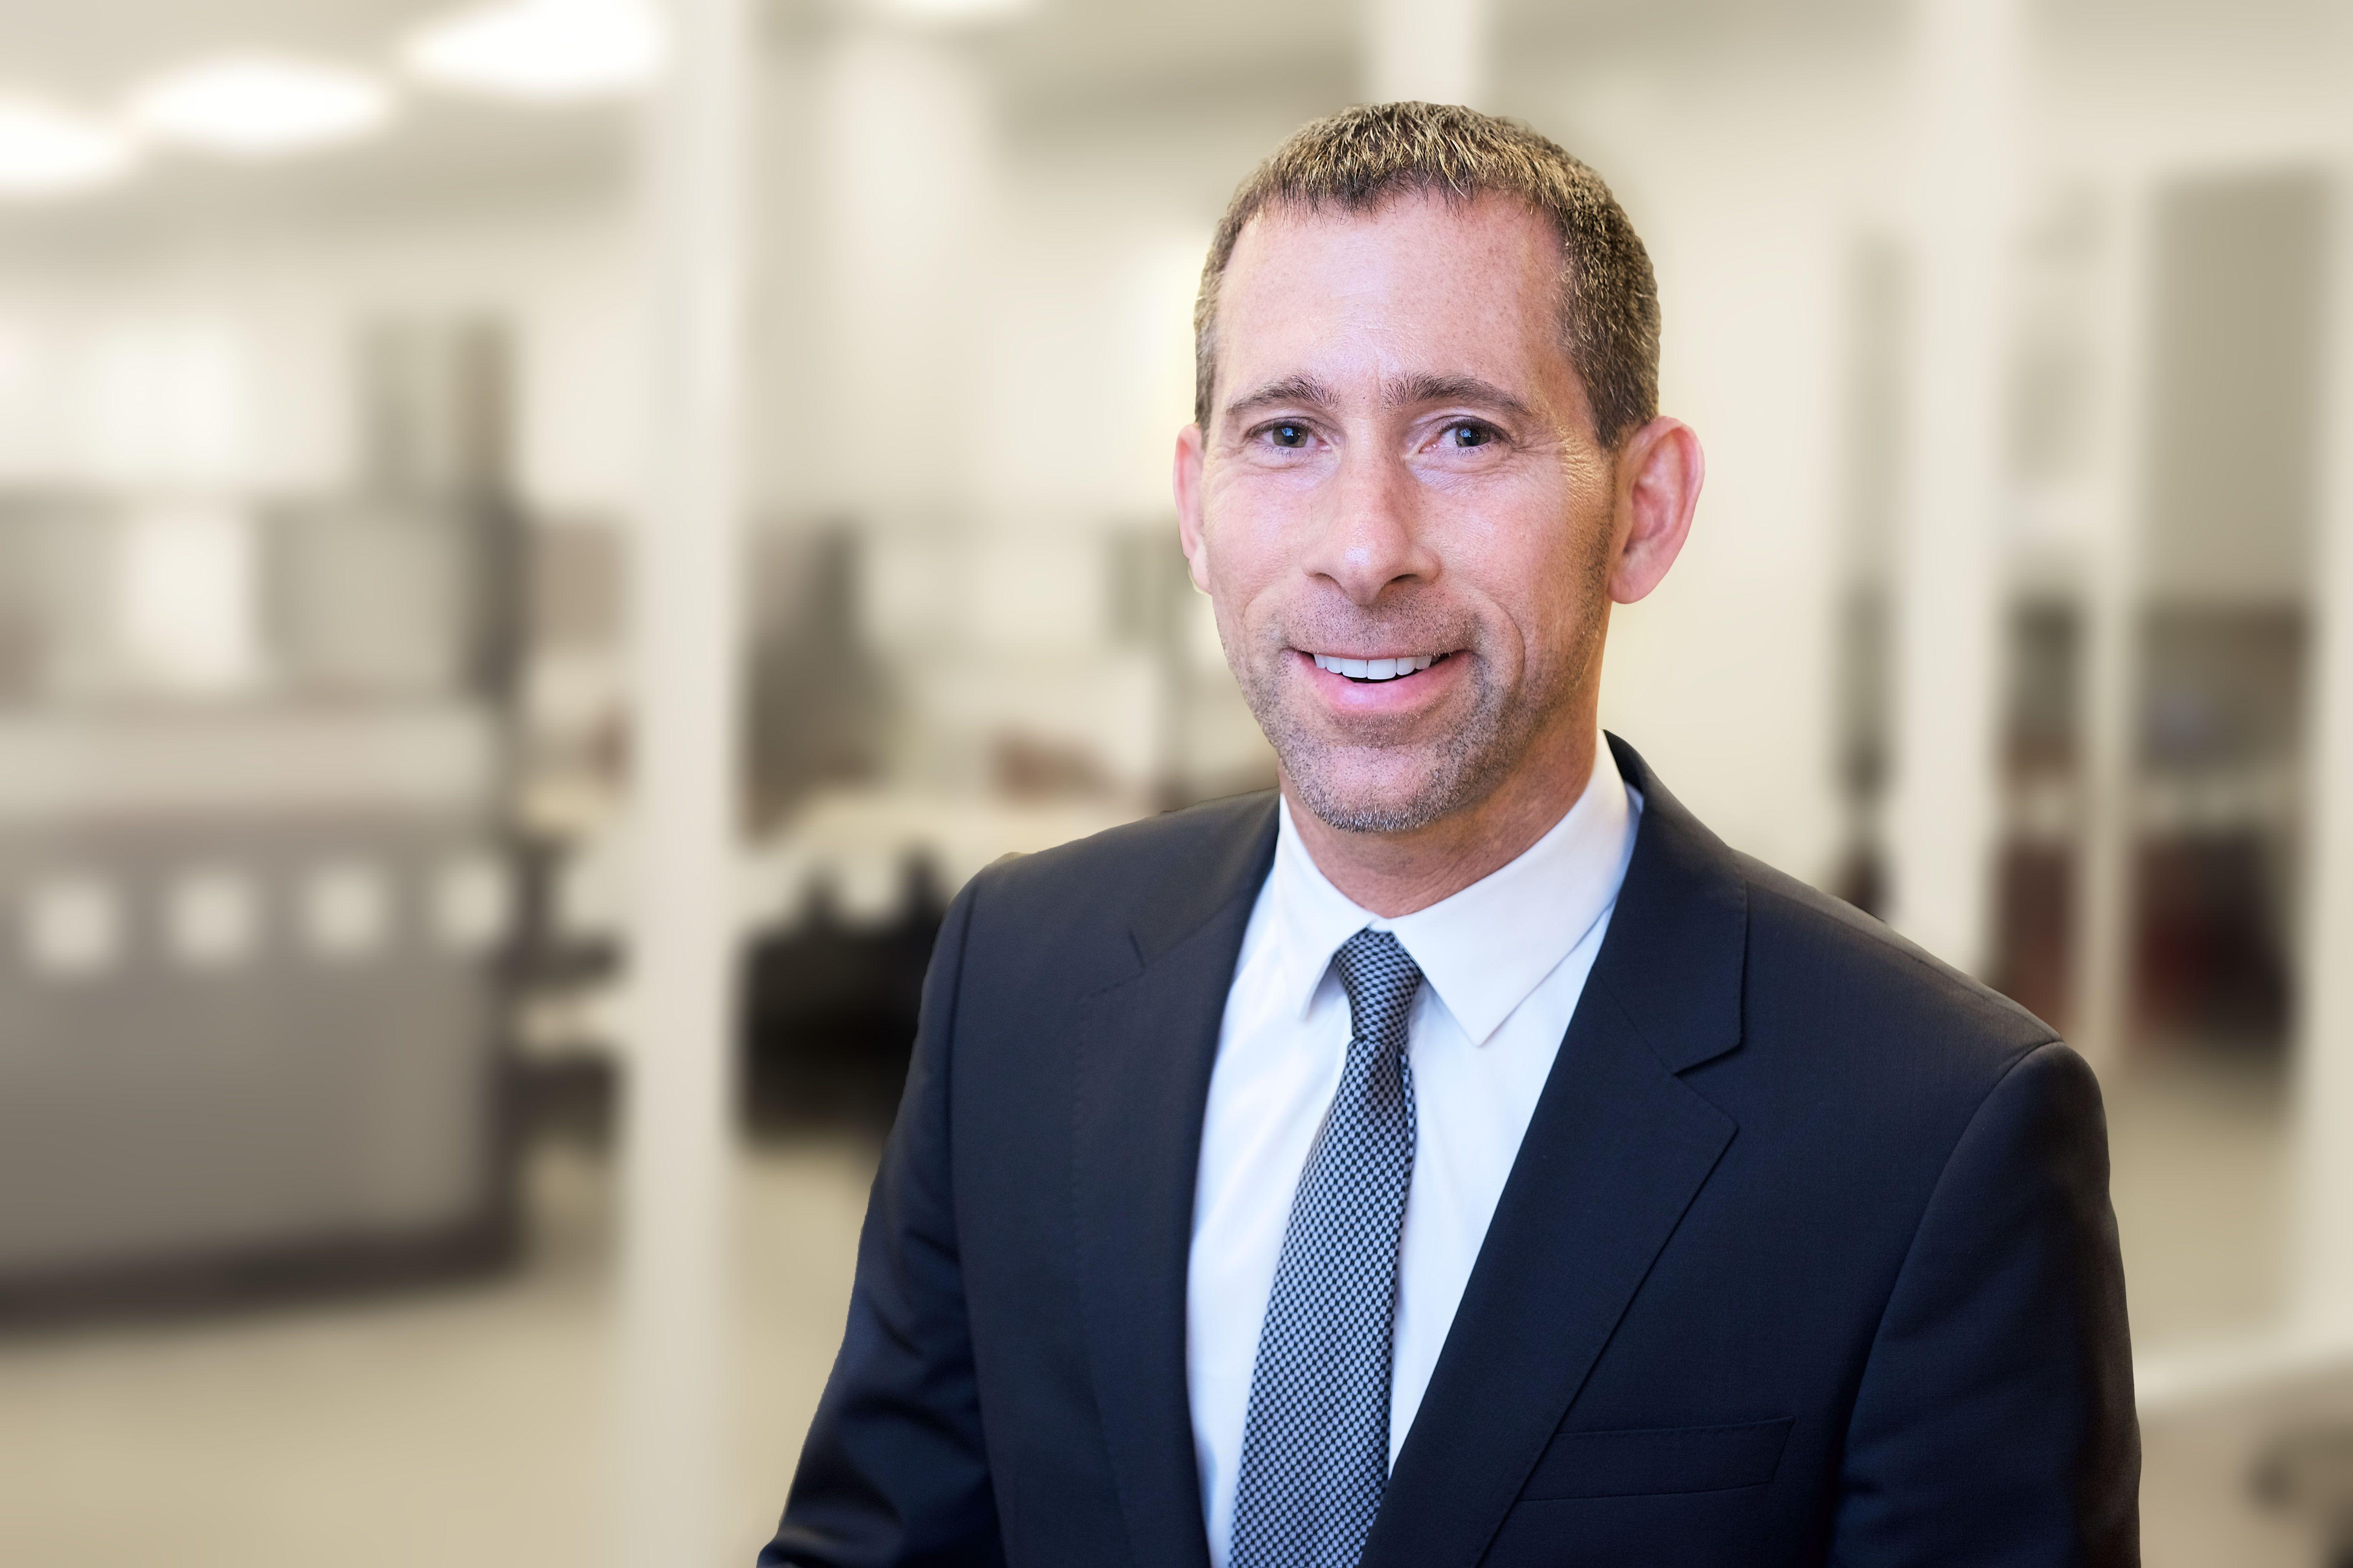 Jason Mausberg, Managing Director of itelligence Canada